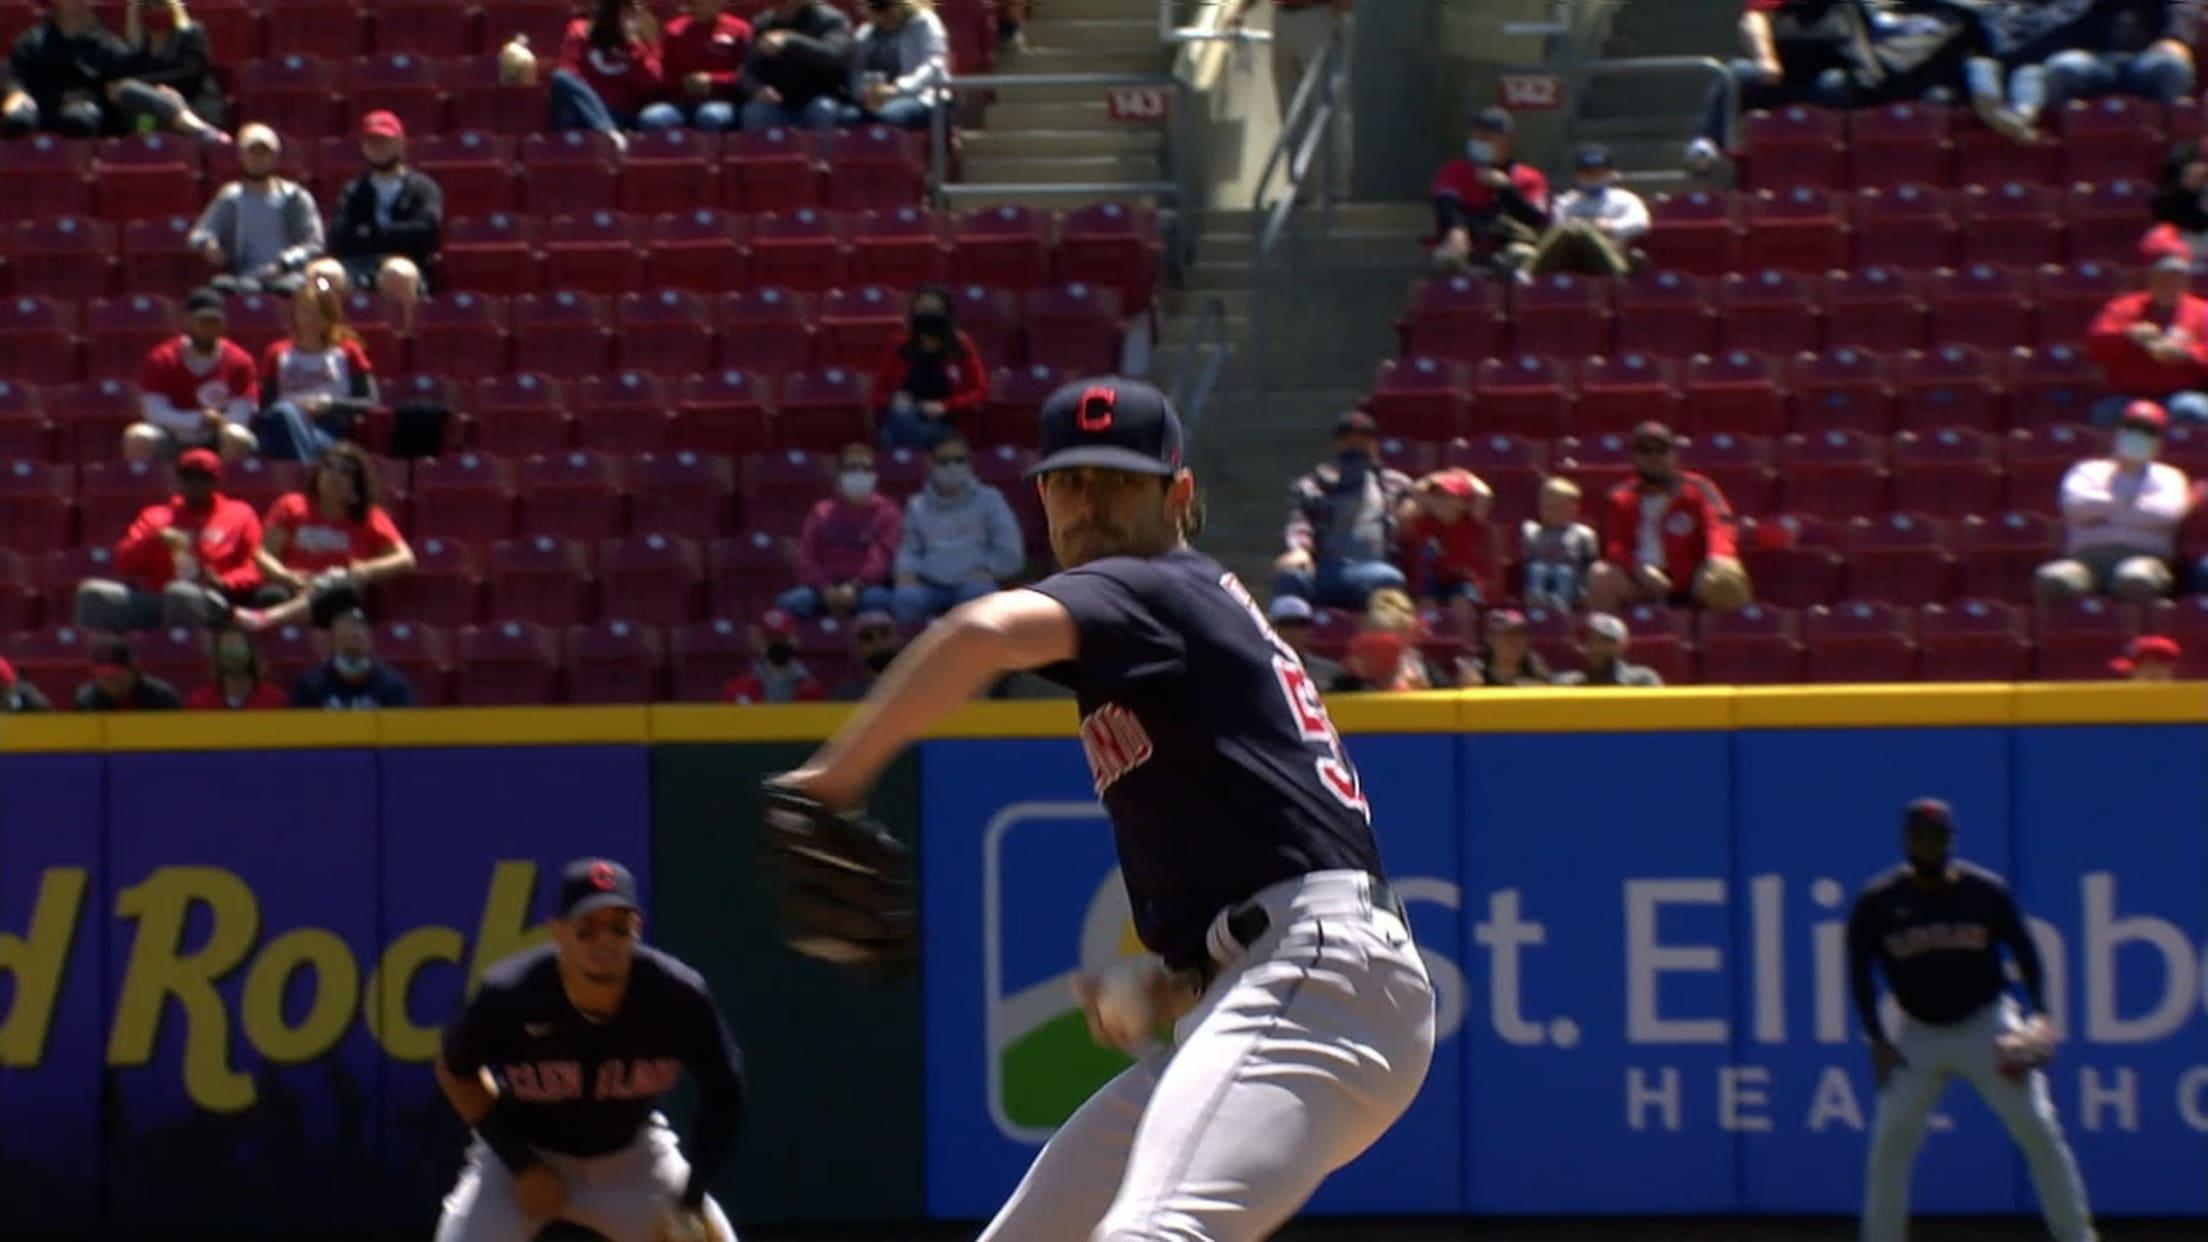 【MLB】インディアンス シェーン・ビーバー 投球ダイジェスト 4.19